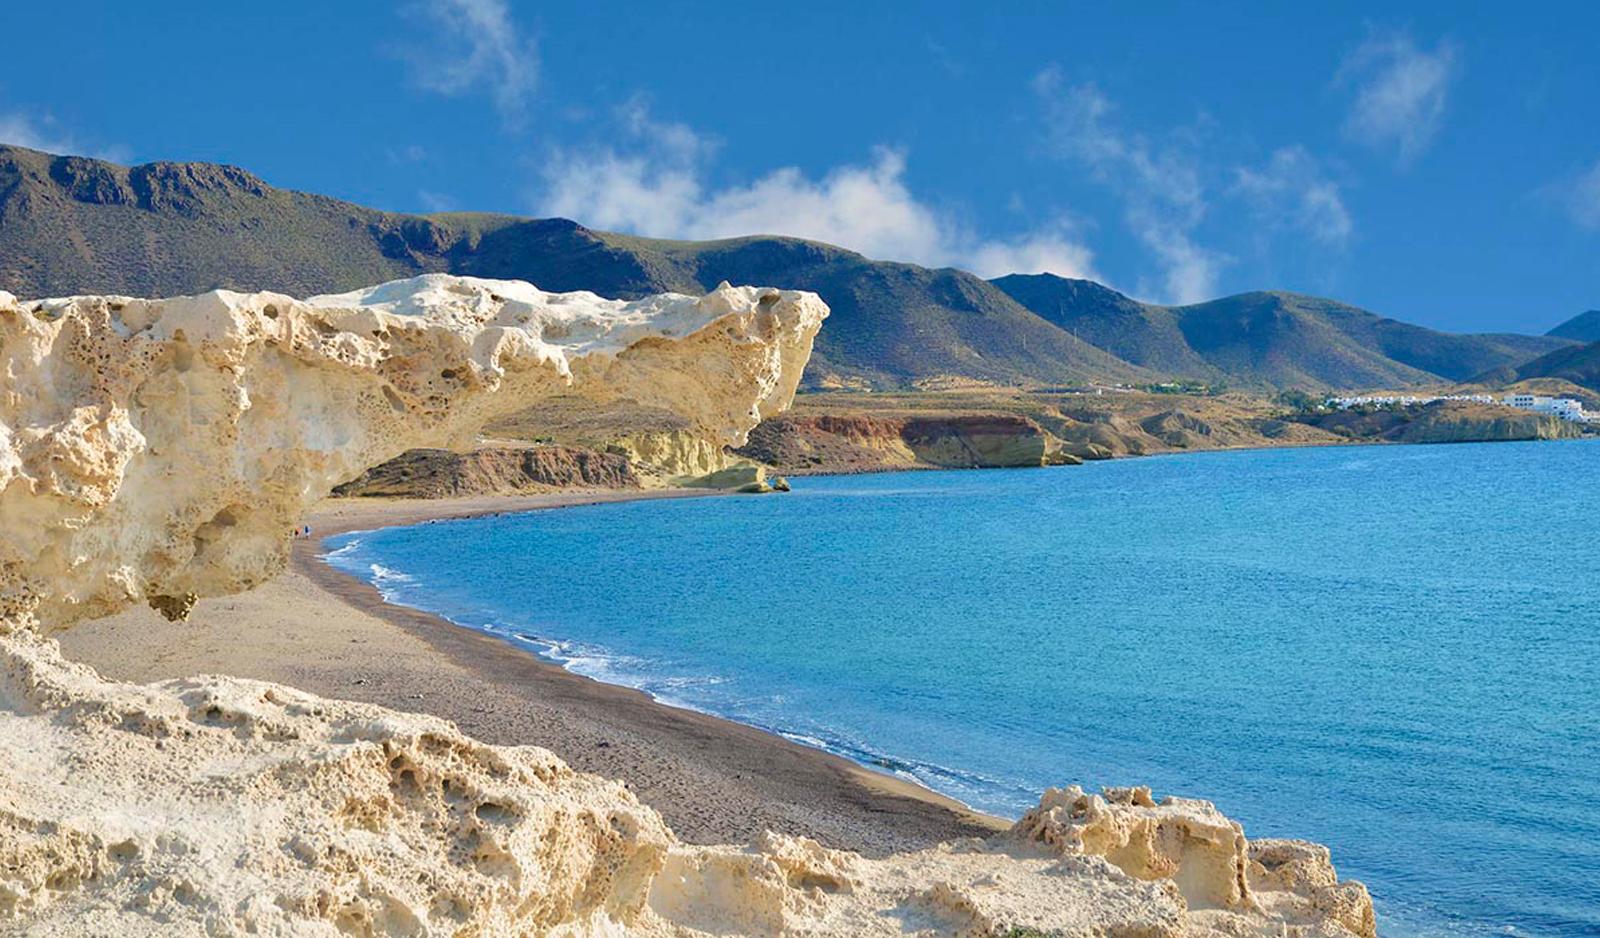 Spiaggia di Los Escullos (Níjar)